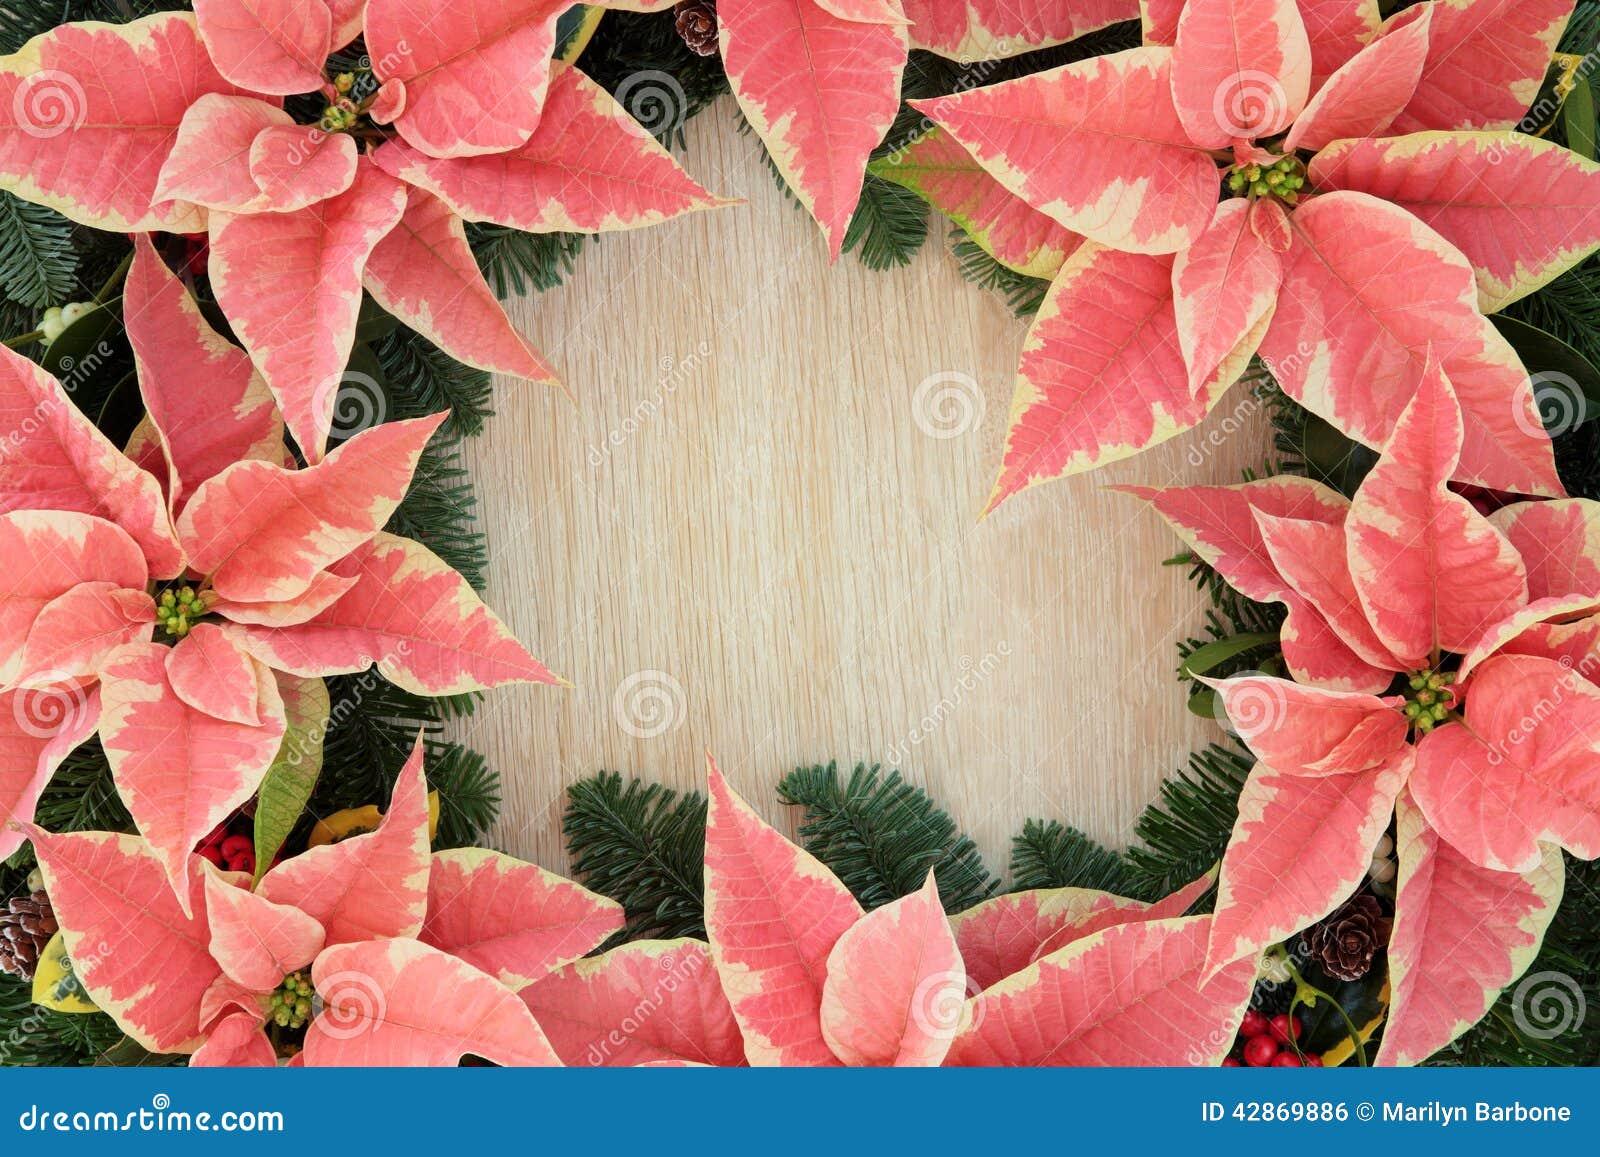 Poinsettia flower border stock photo image of space